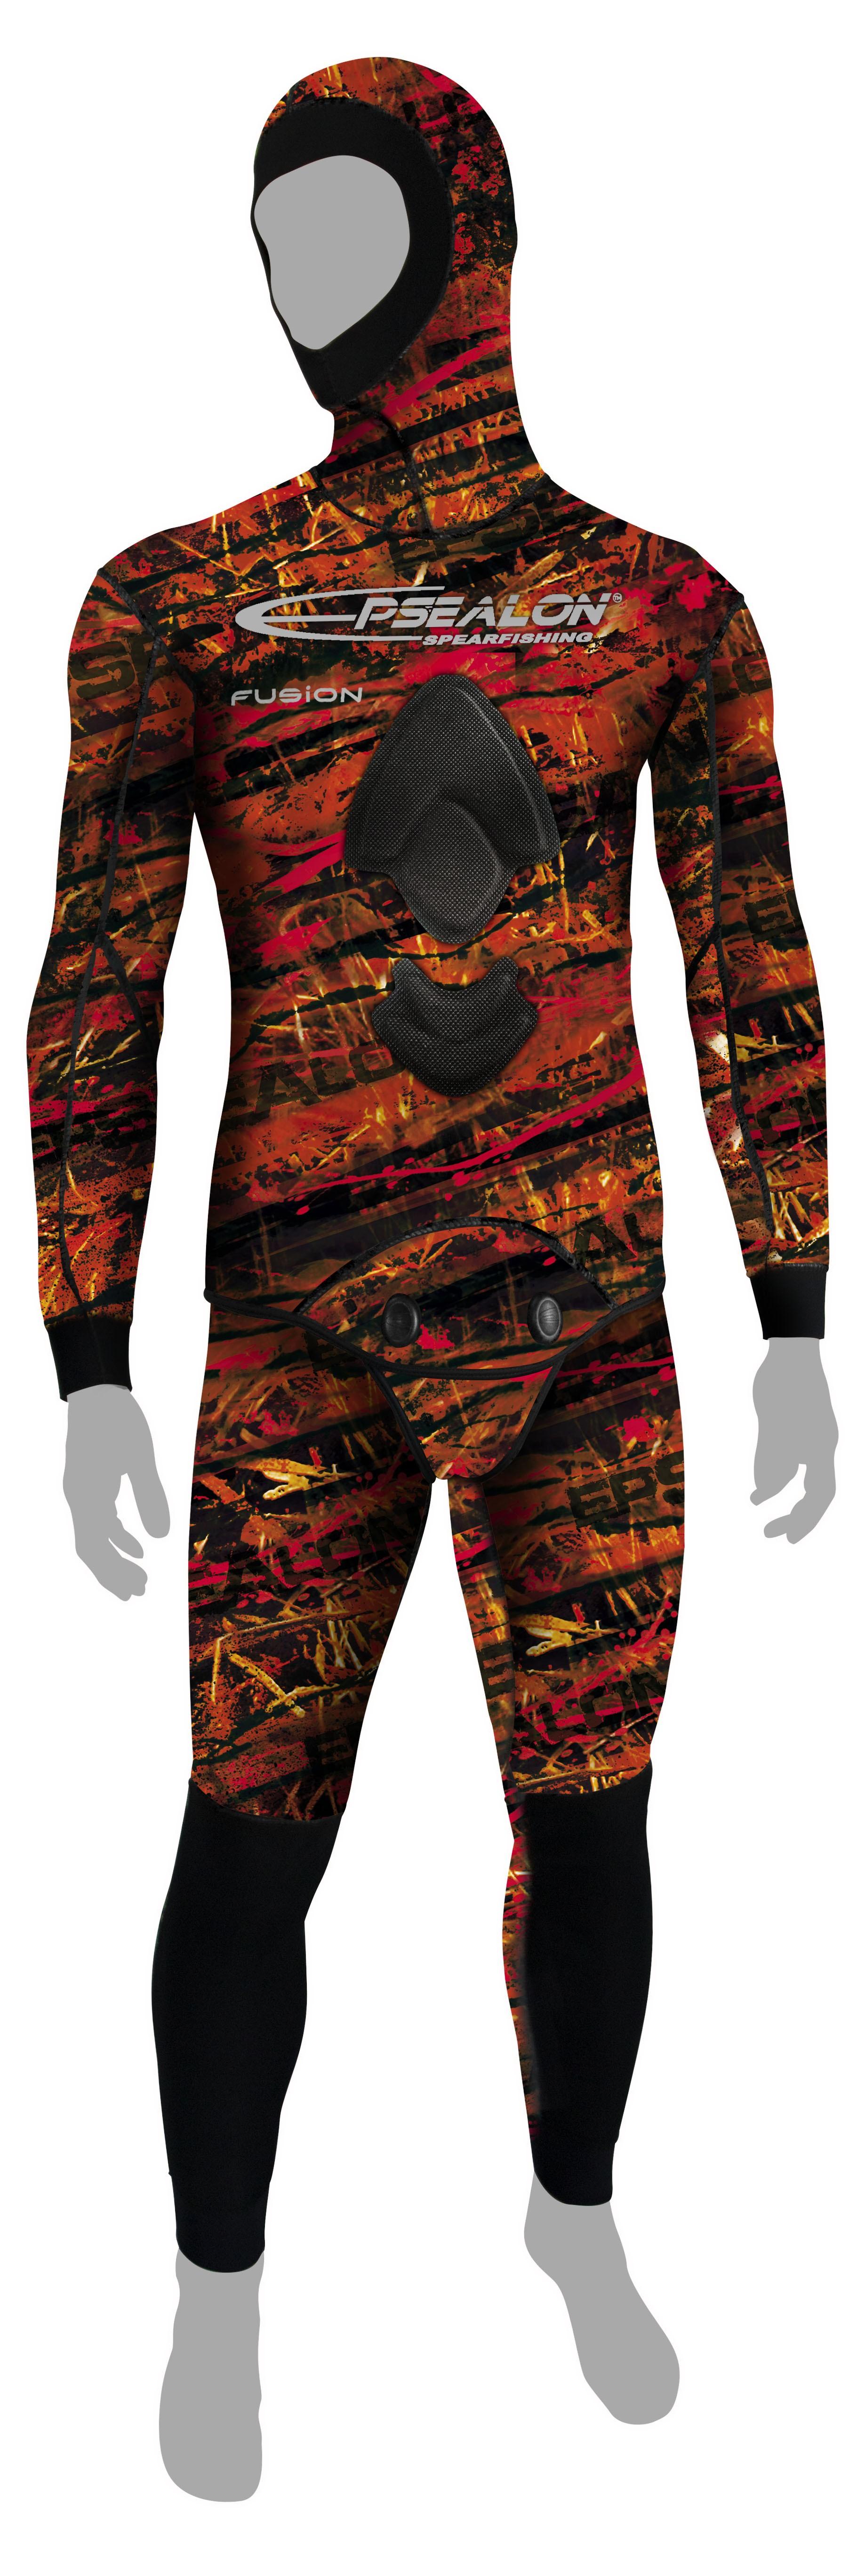 Combinaison Epsealon Red Fusion V2 (Veste 5 mm + pantalon 5 mm)